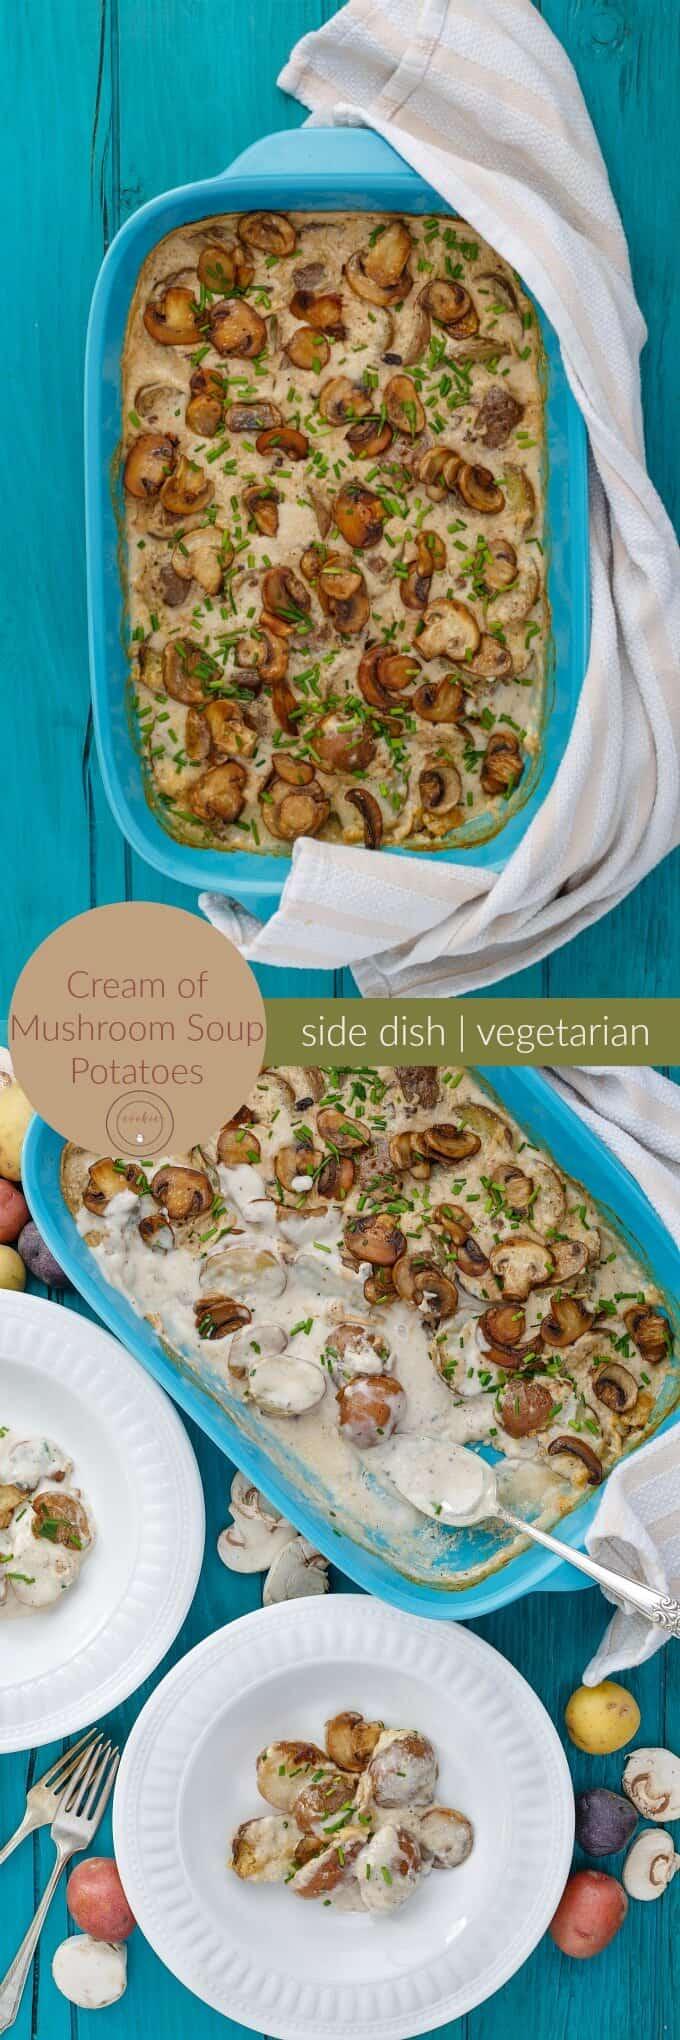 Cream of Mushroom Soup Potatoes